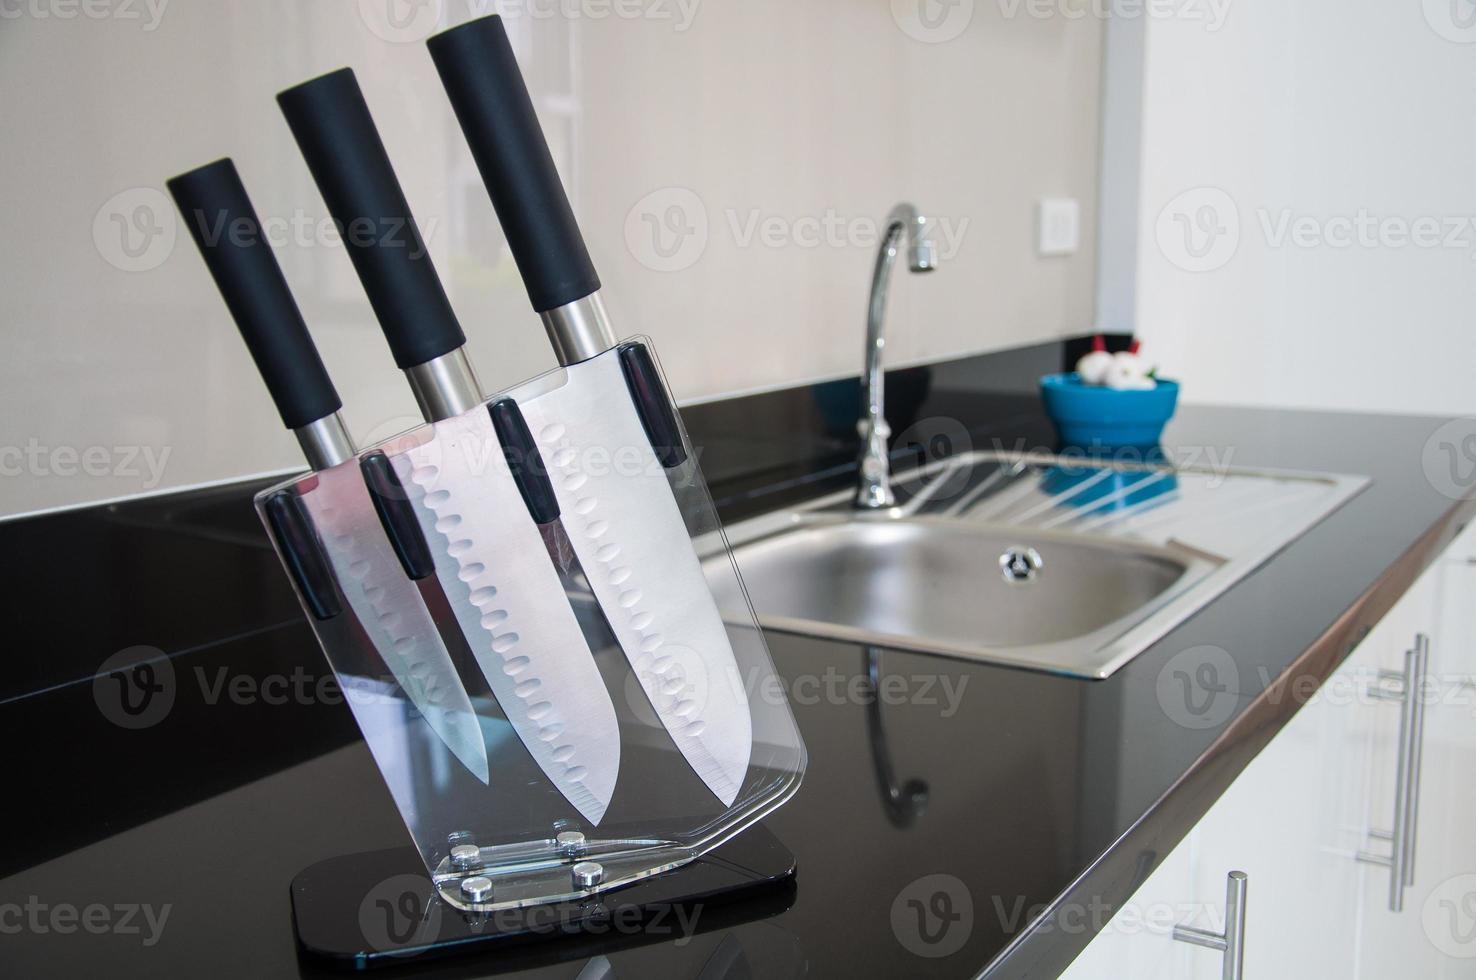 Kitchen knife. photo